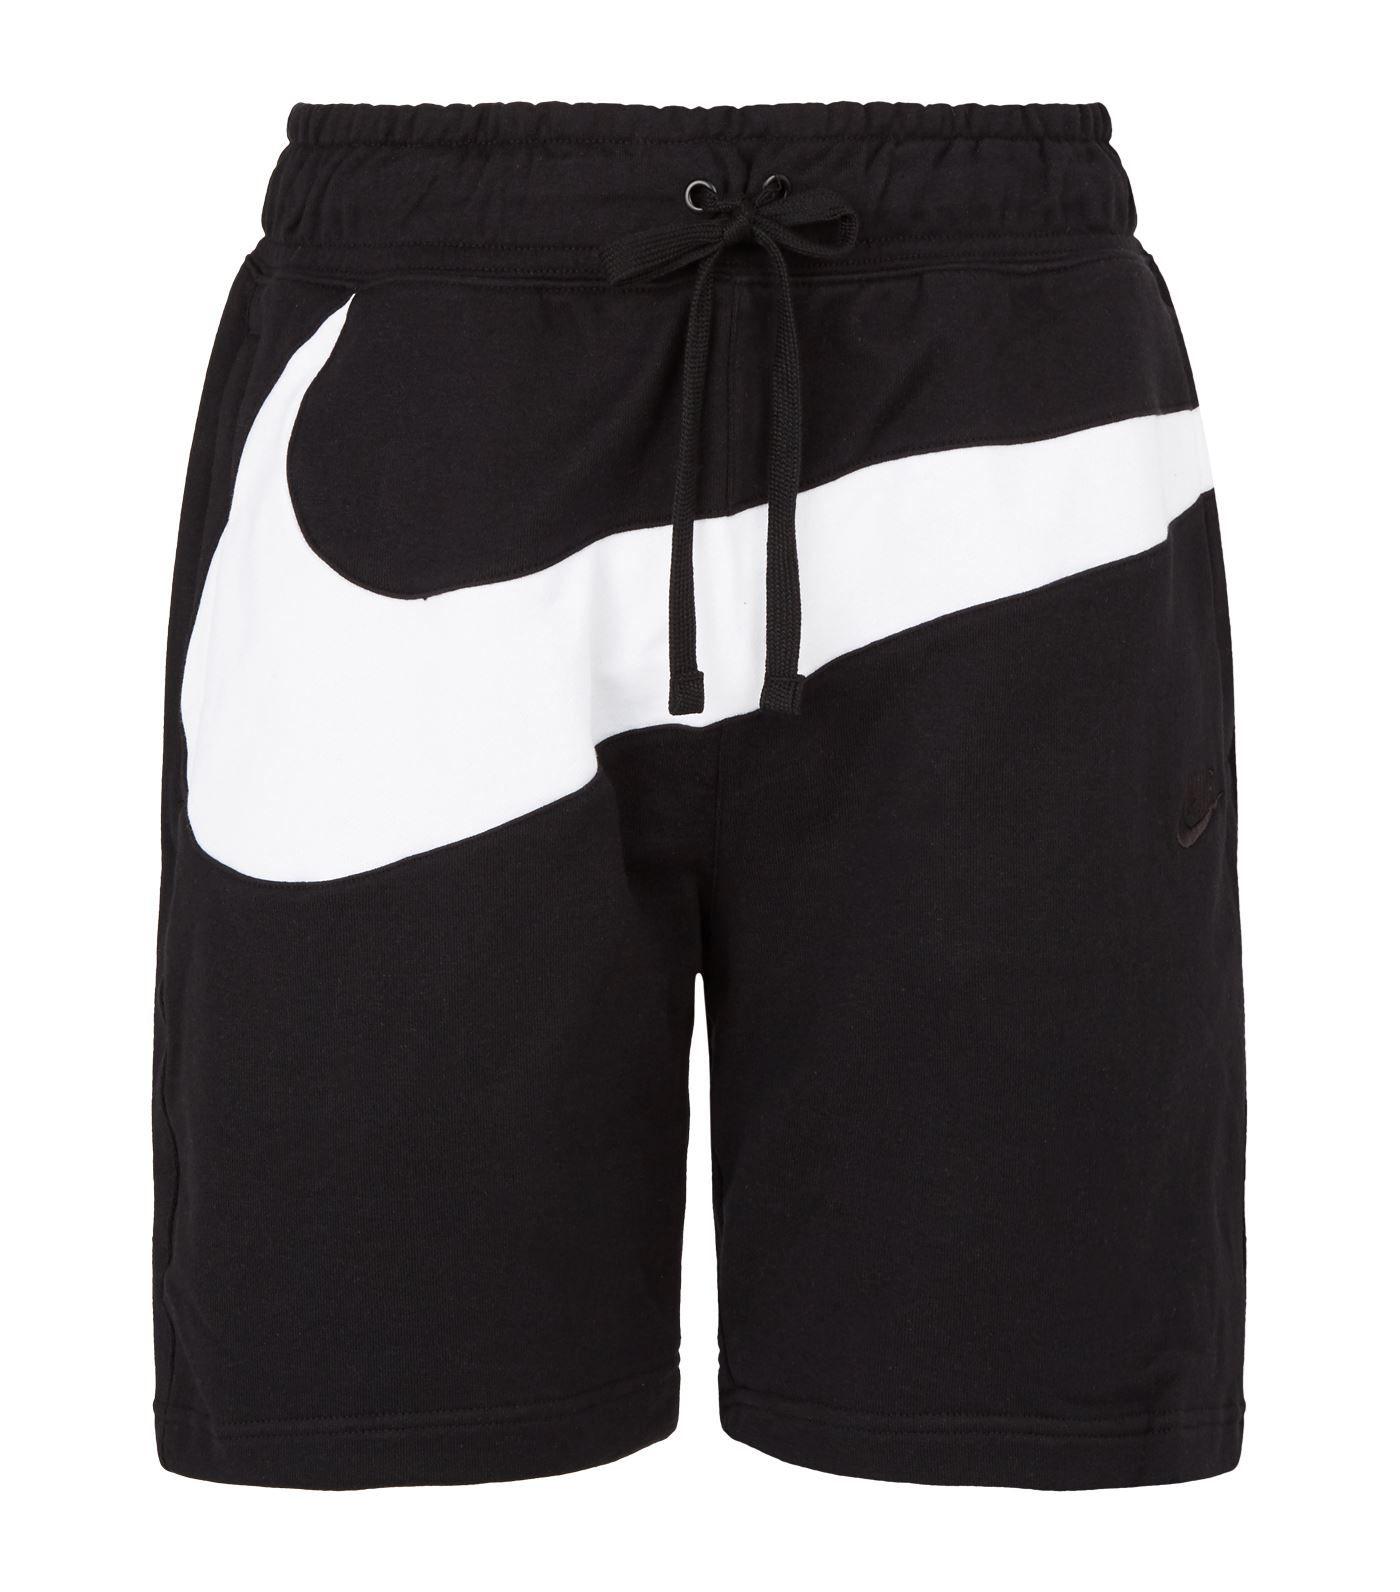 Nike Swoosh Sweat Shorts In Black | ModeSens | Black shorts ...